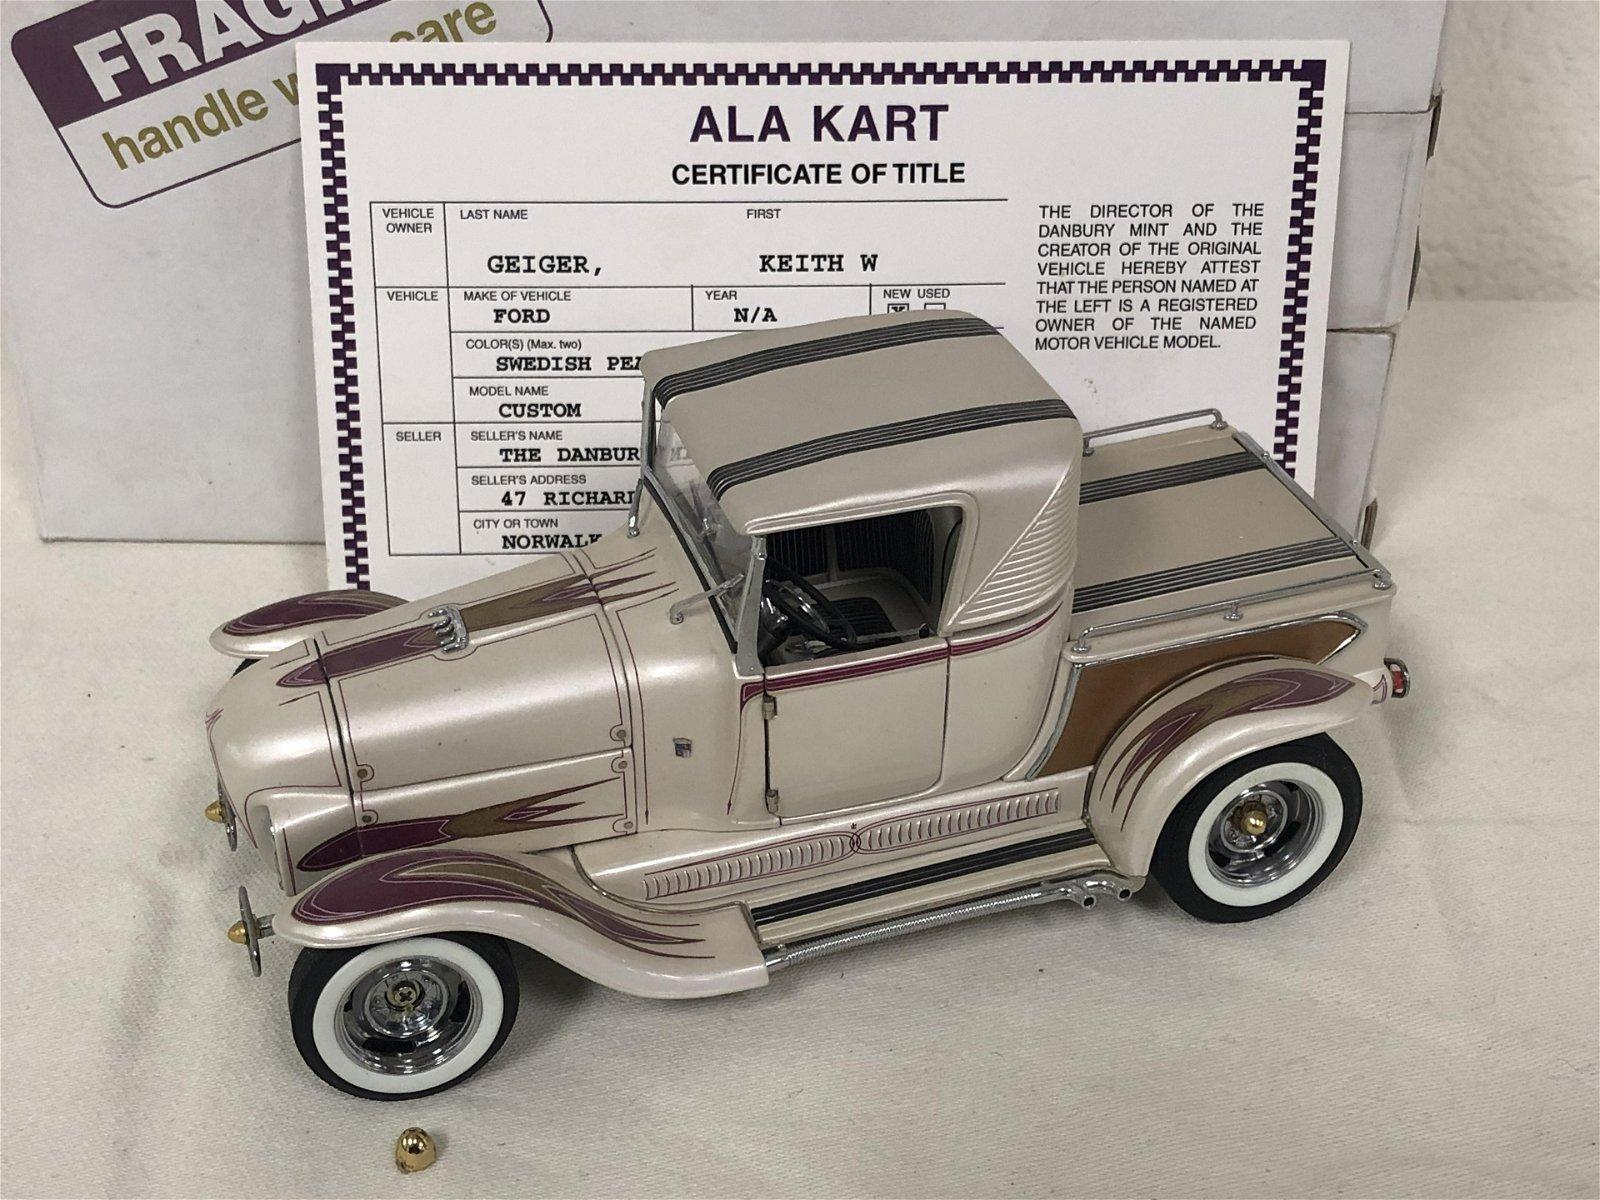 Diecast 'AlaKart' Custom Roadster Model - Original Box